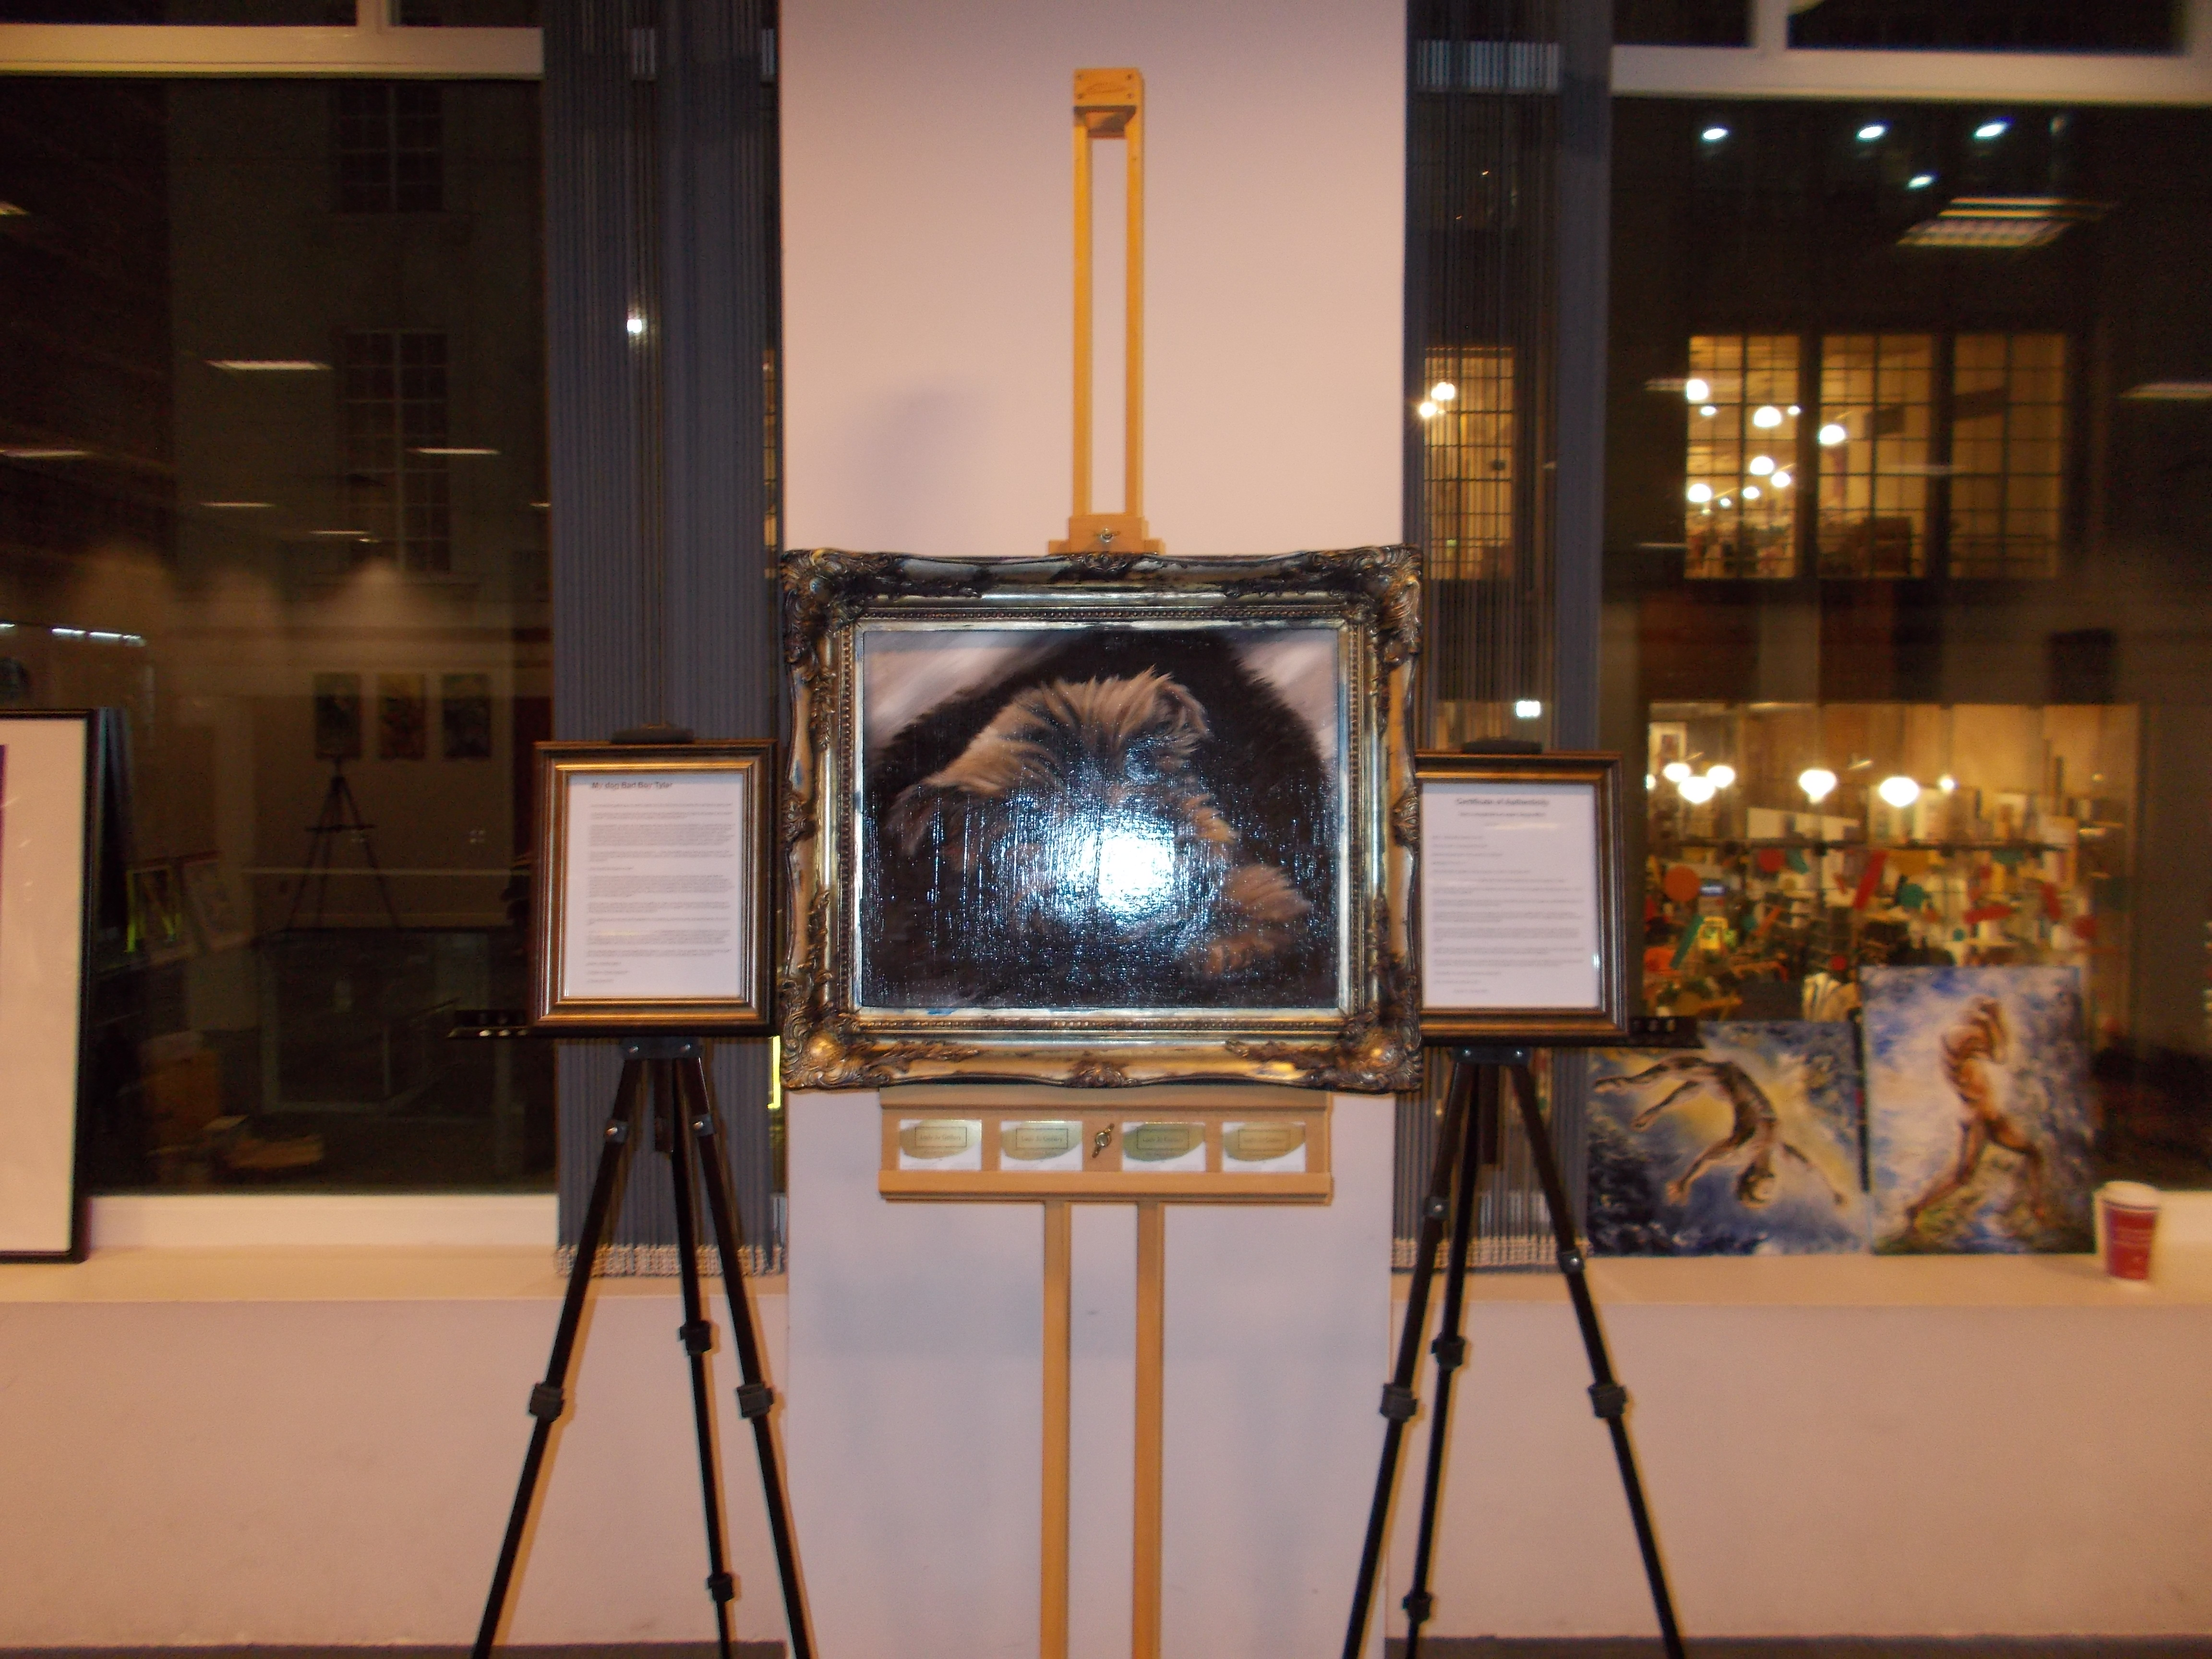 30-2- jurita-art and basketball- exhibition 12-22 november 2019 in Rossotrudnichestvo London